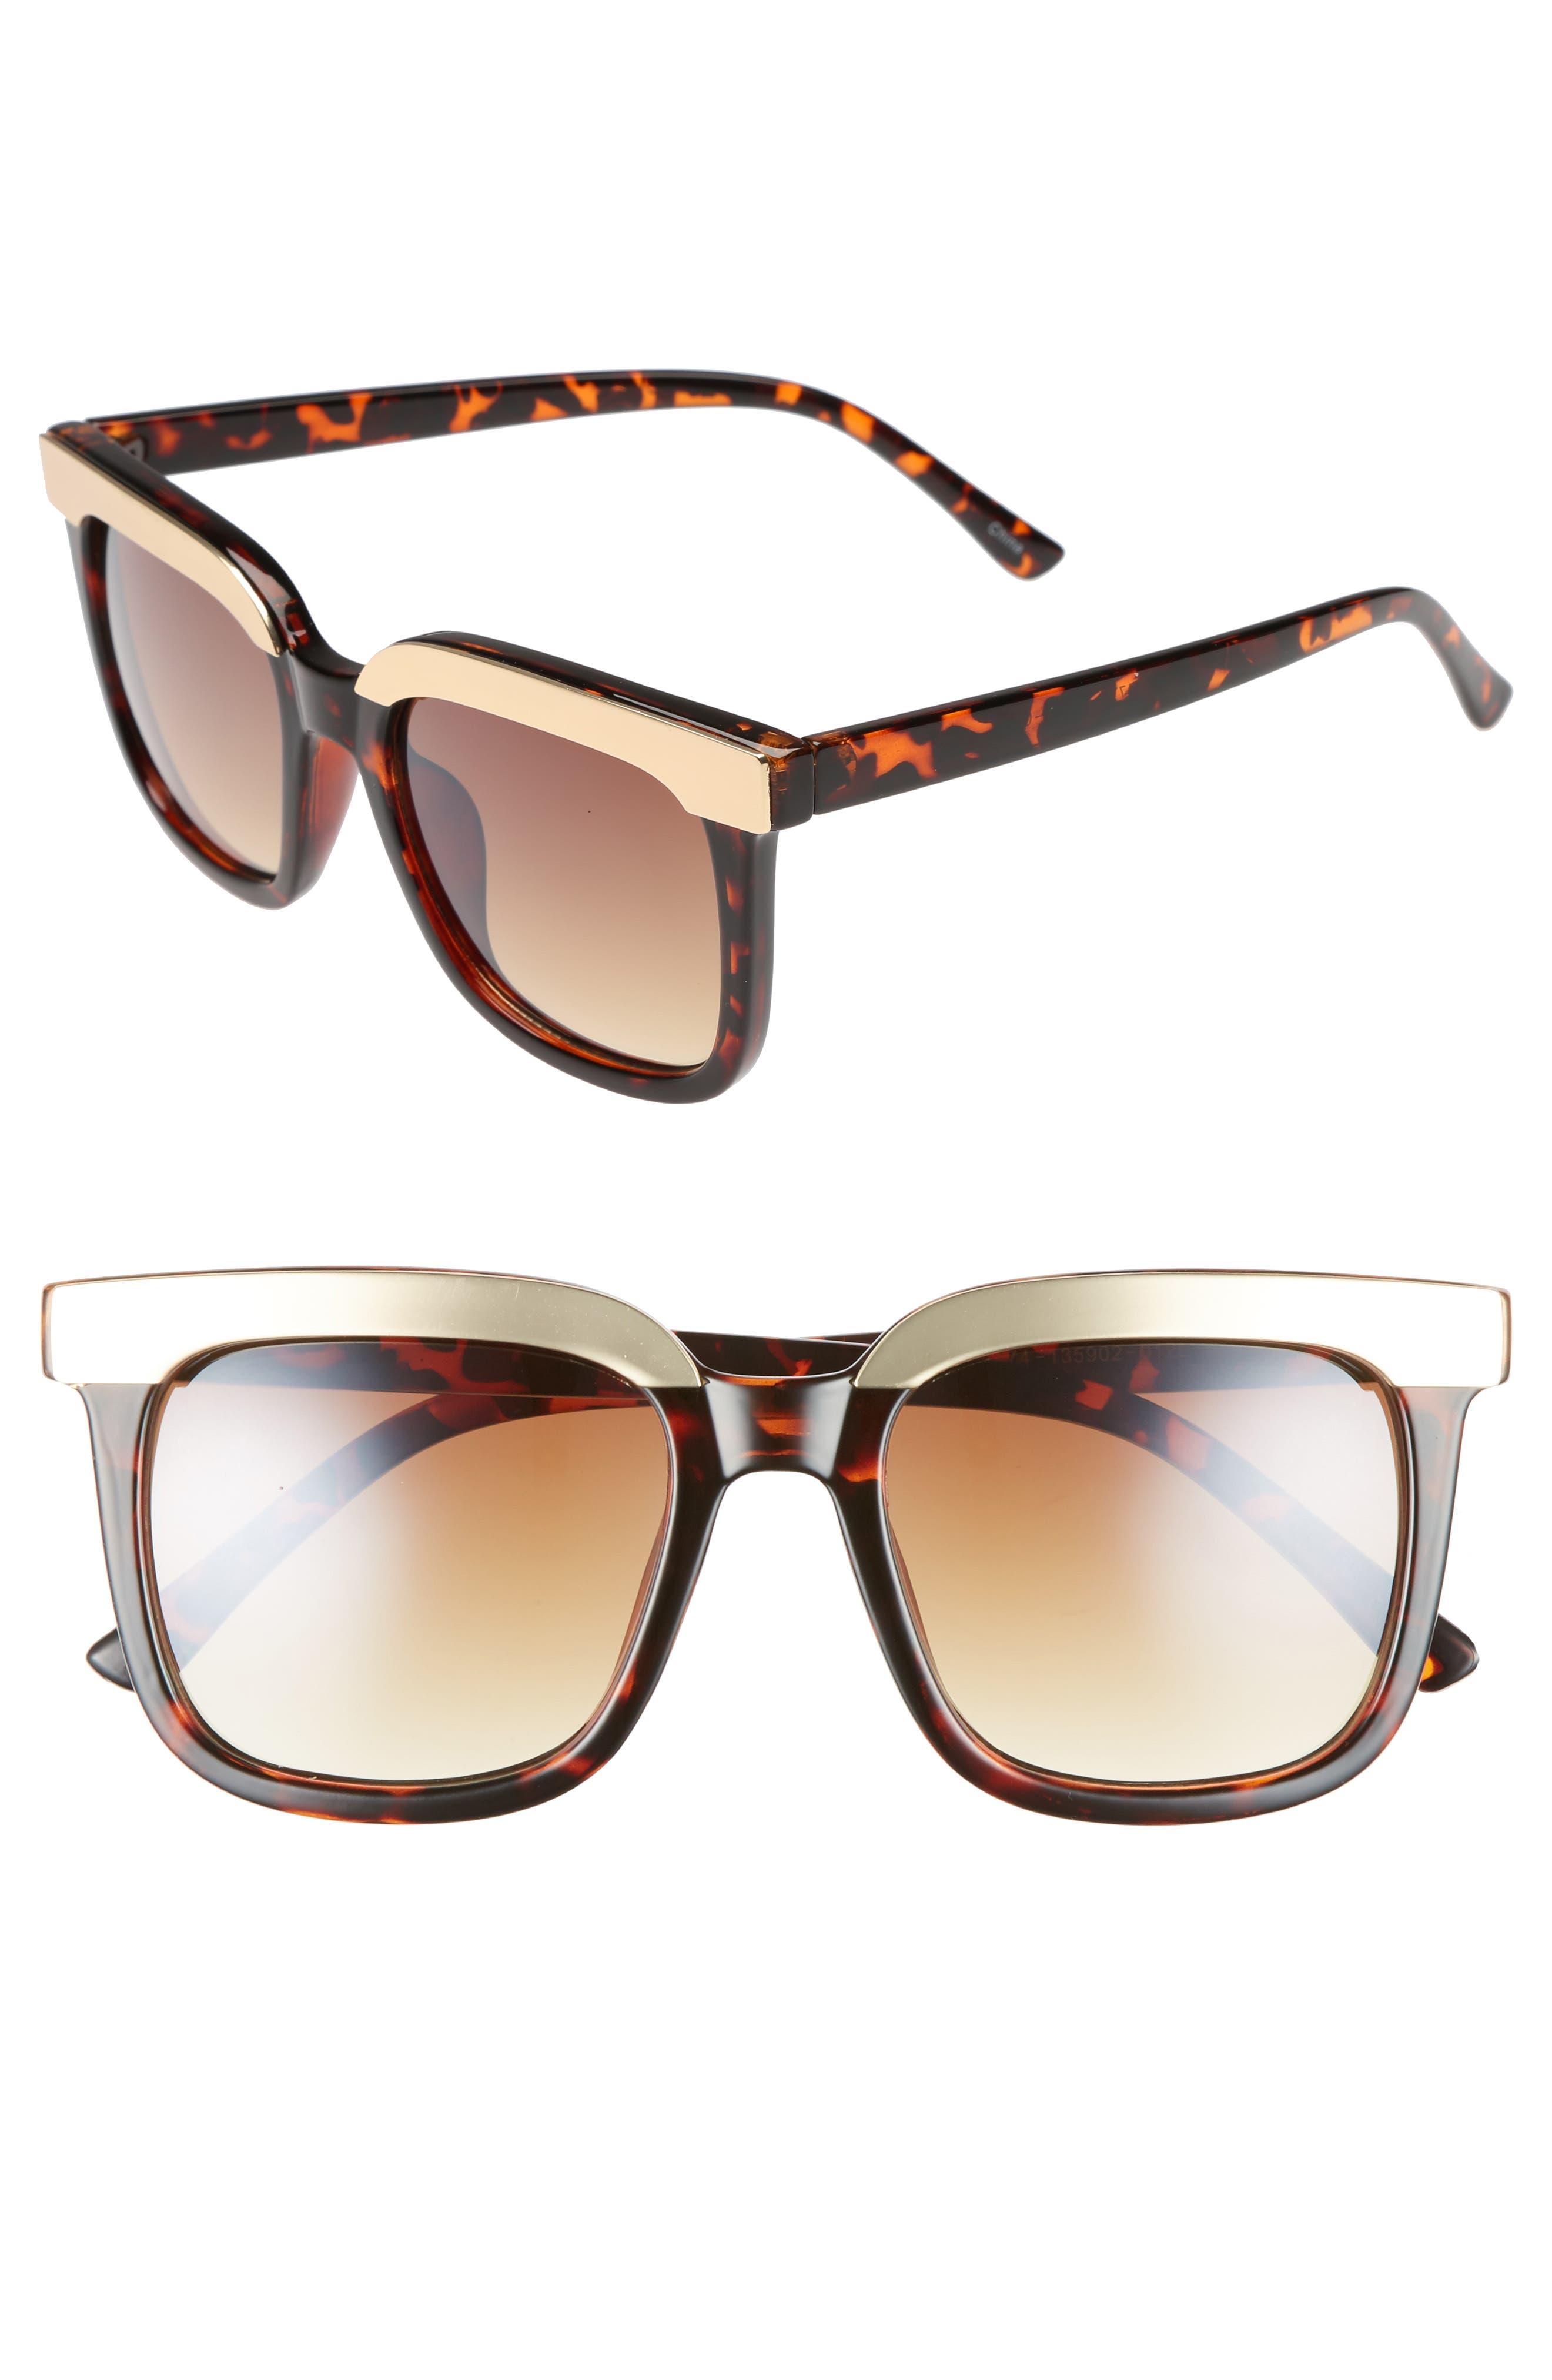 52mm Metal Dipped Square Sunglasses,                         Main,                         color, 200